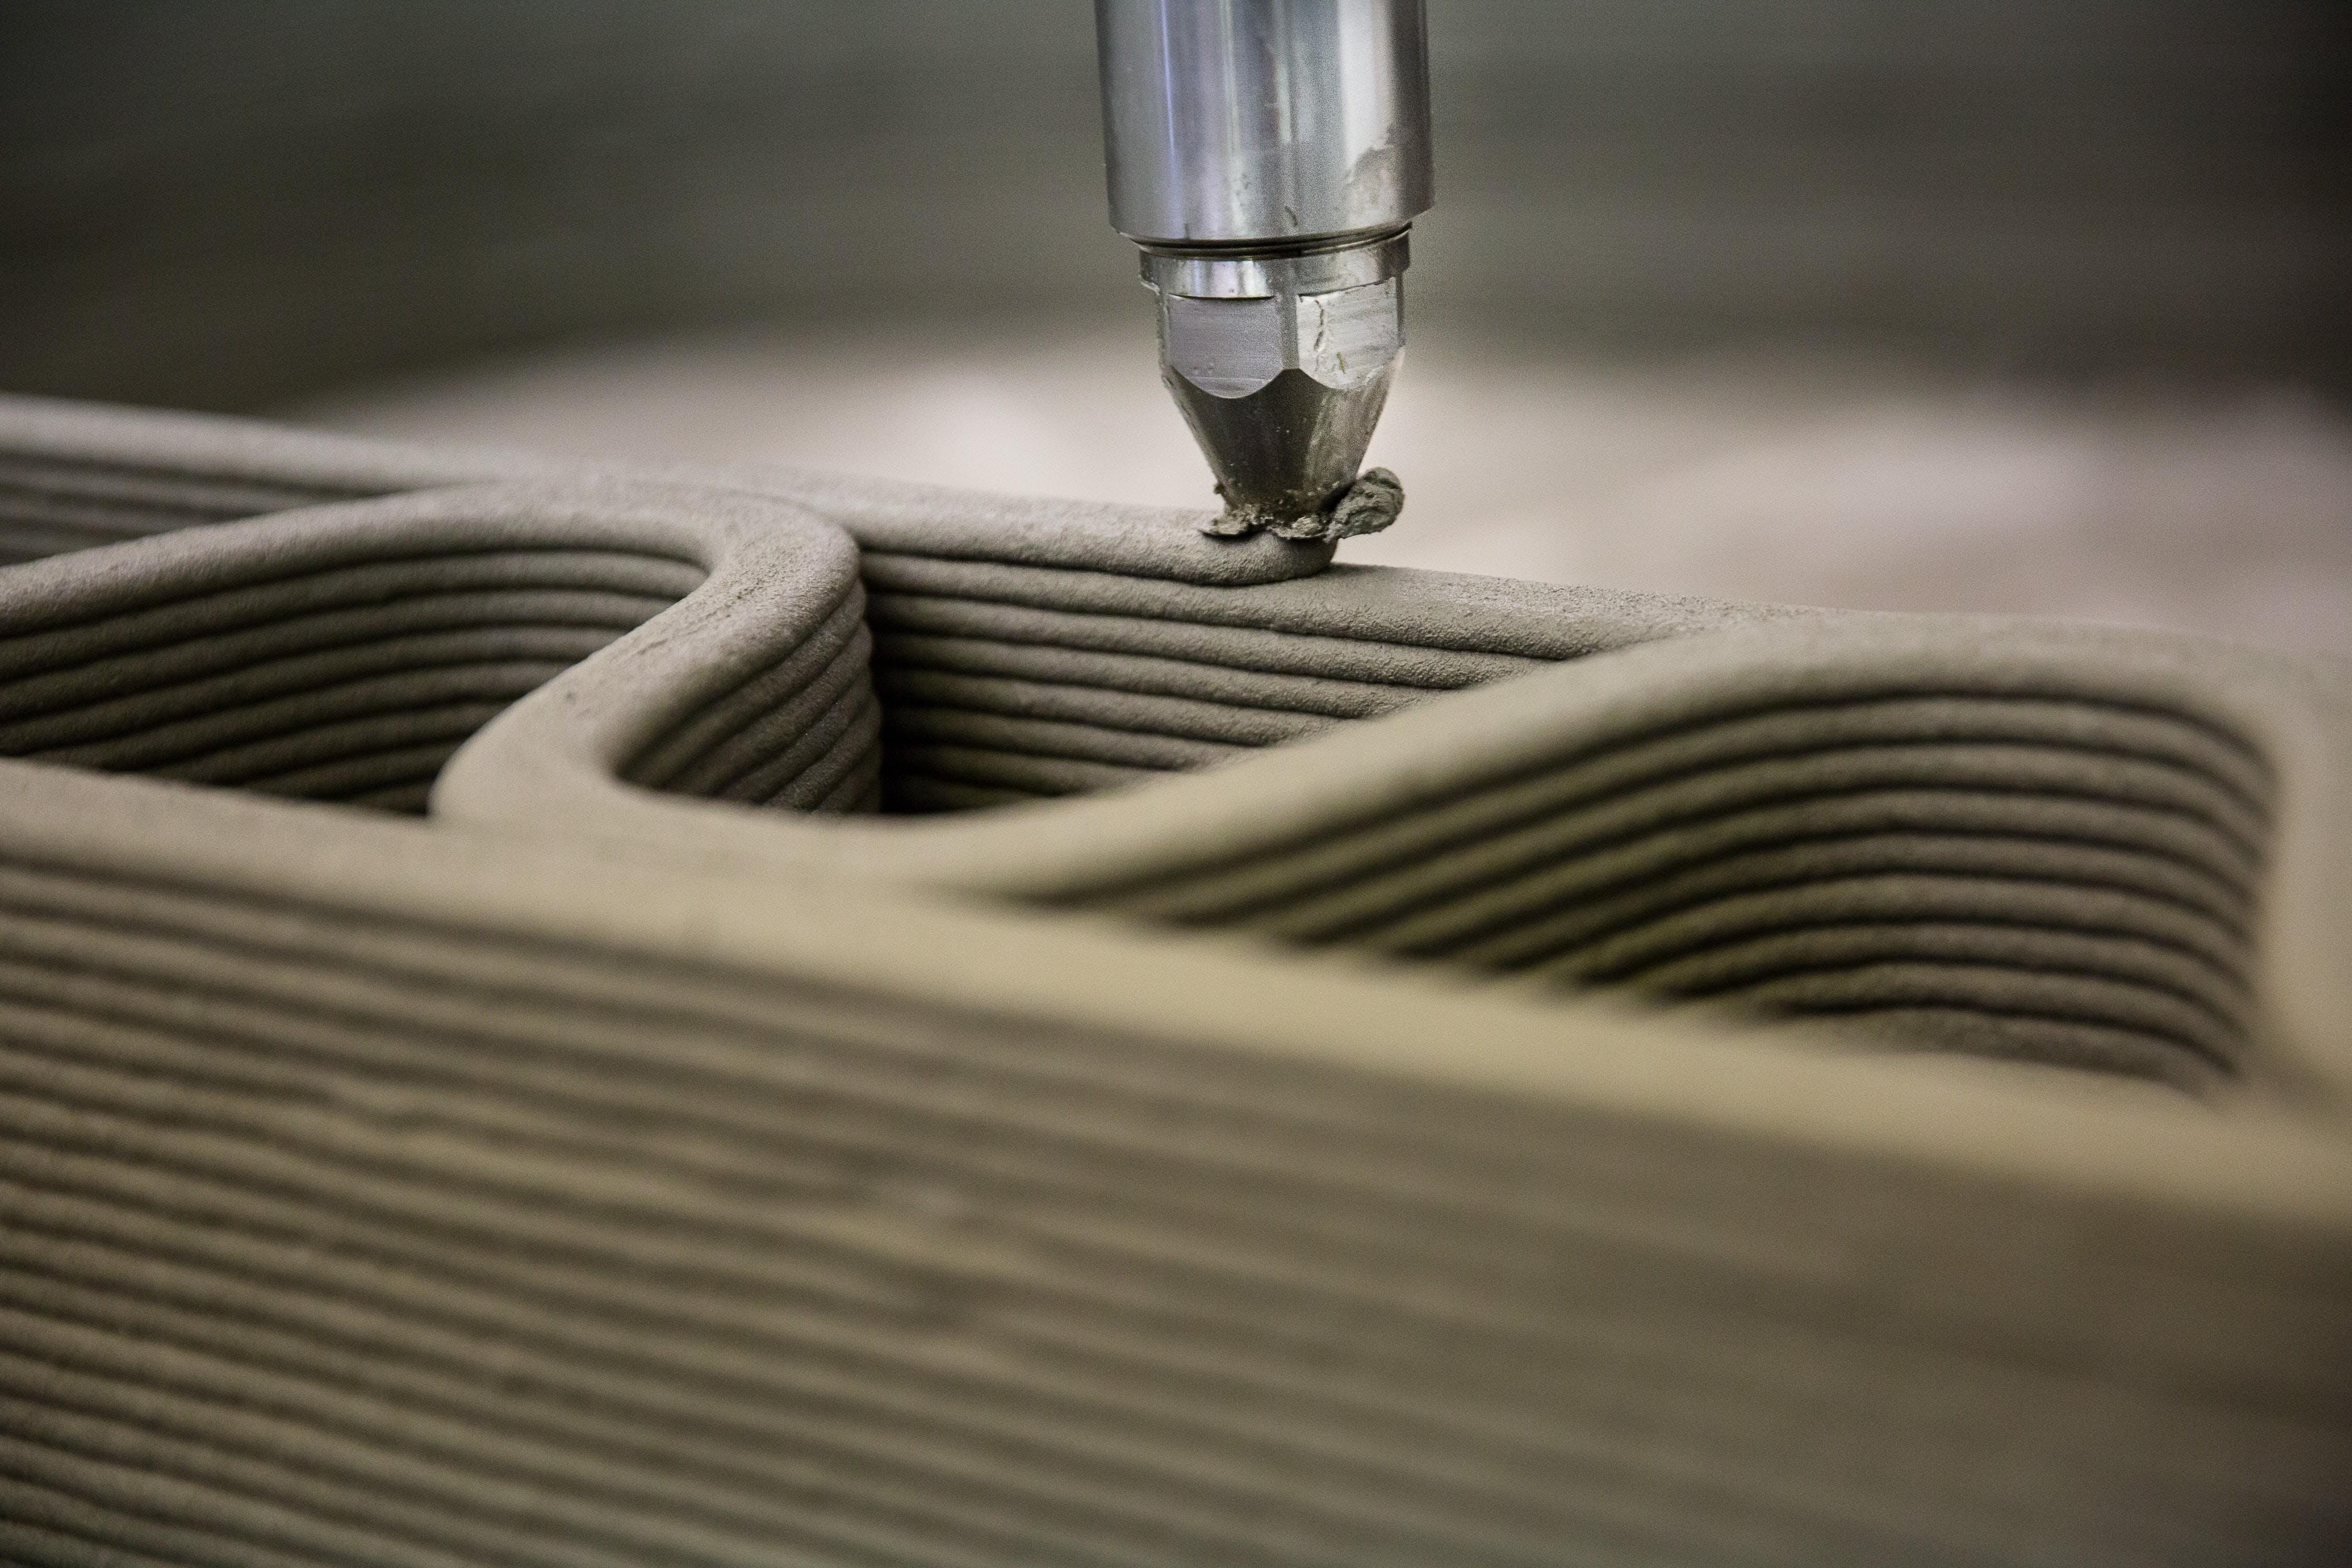 Large-Scale 3D Printing for Construction : De